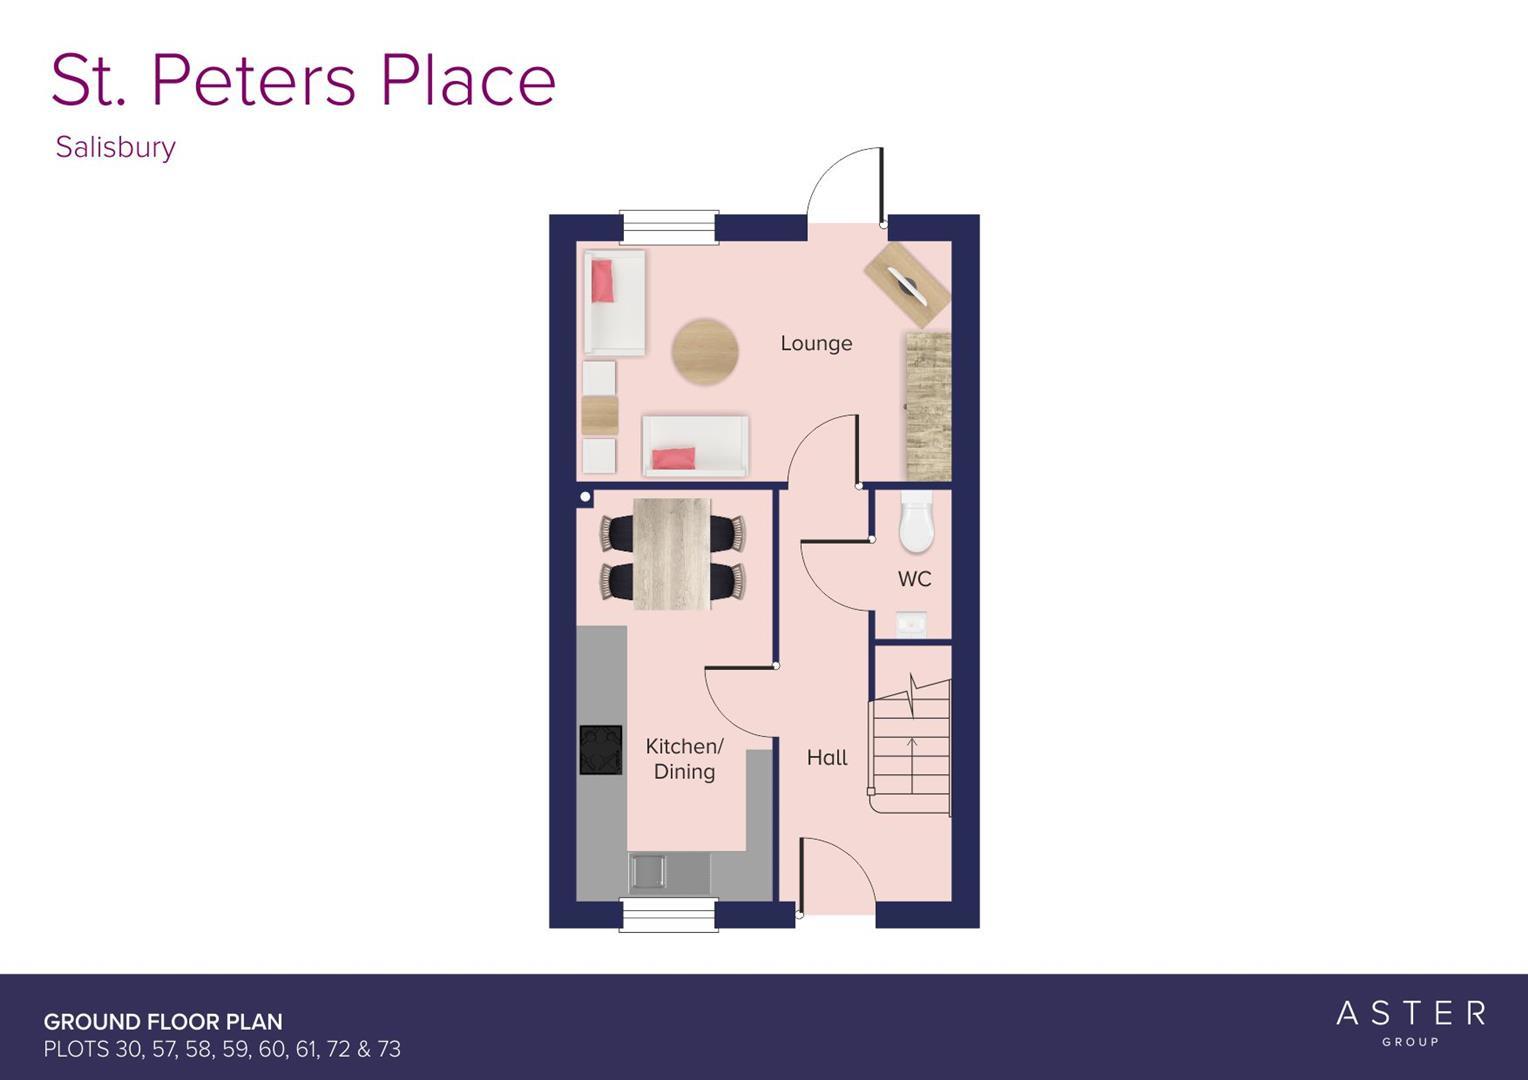 St. Peters Place, Salisbury_Plots 30, 57, 58, 59,